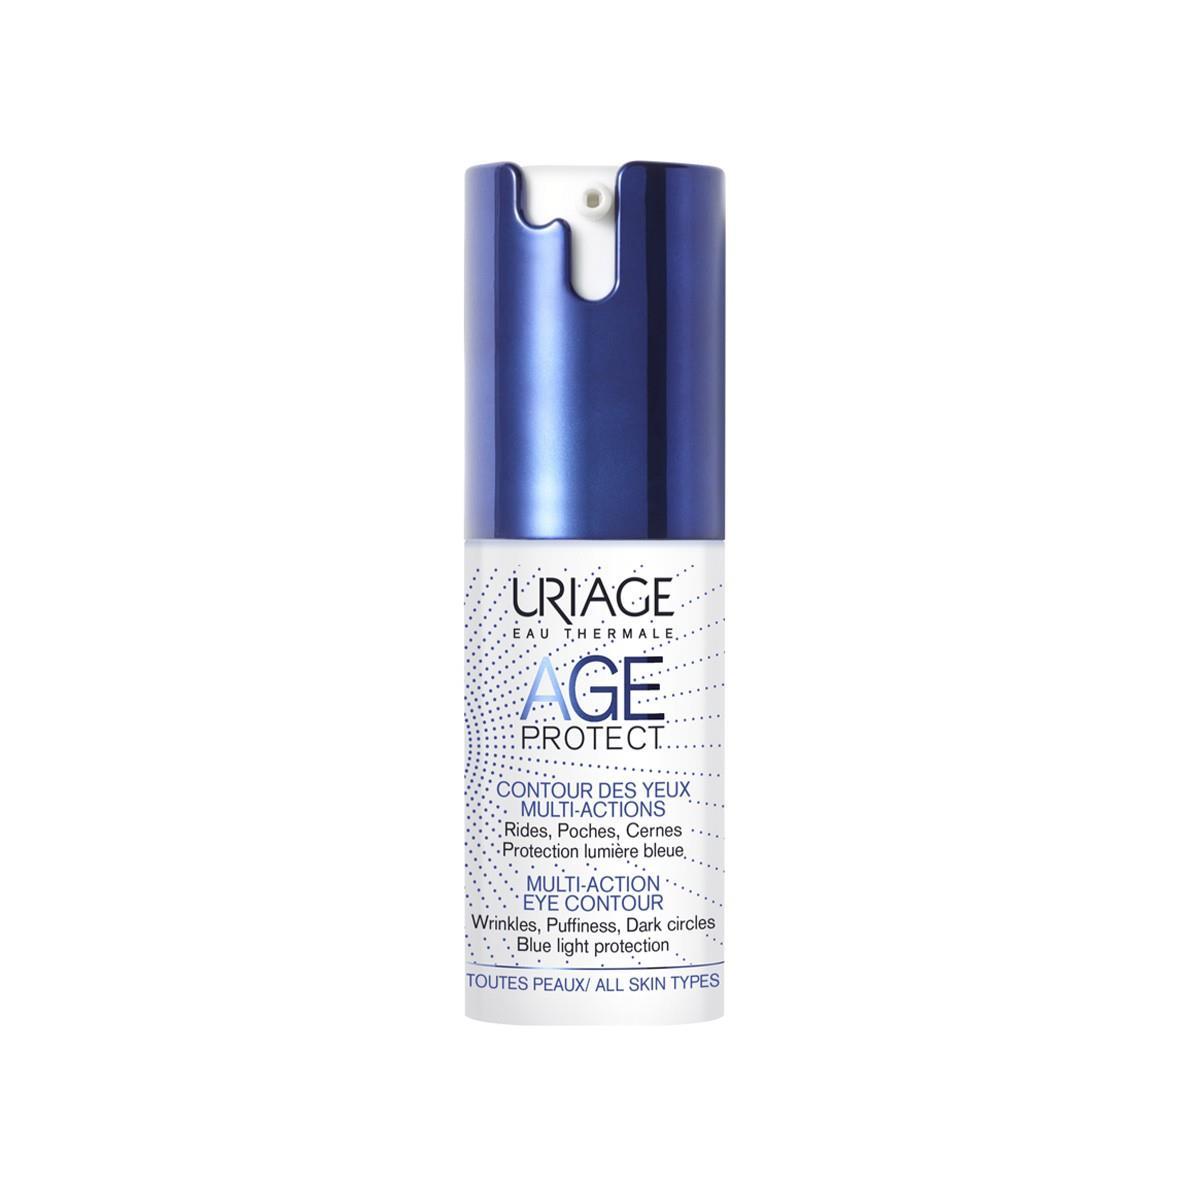 Age Protect Crema Para Contorno De Ojos 15 Ml